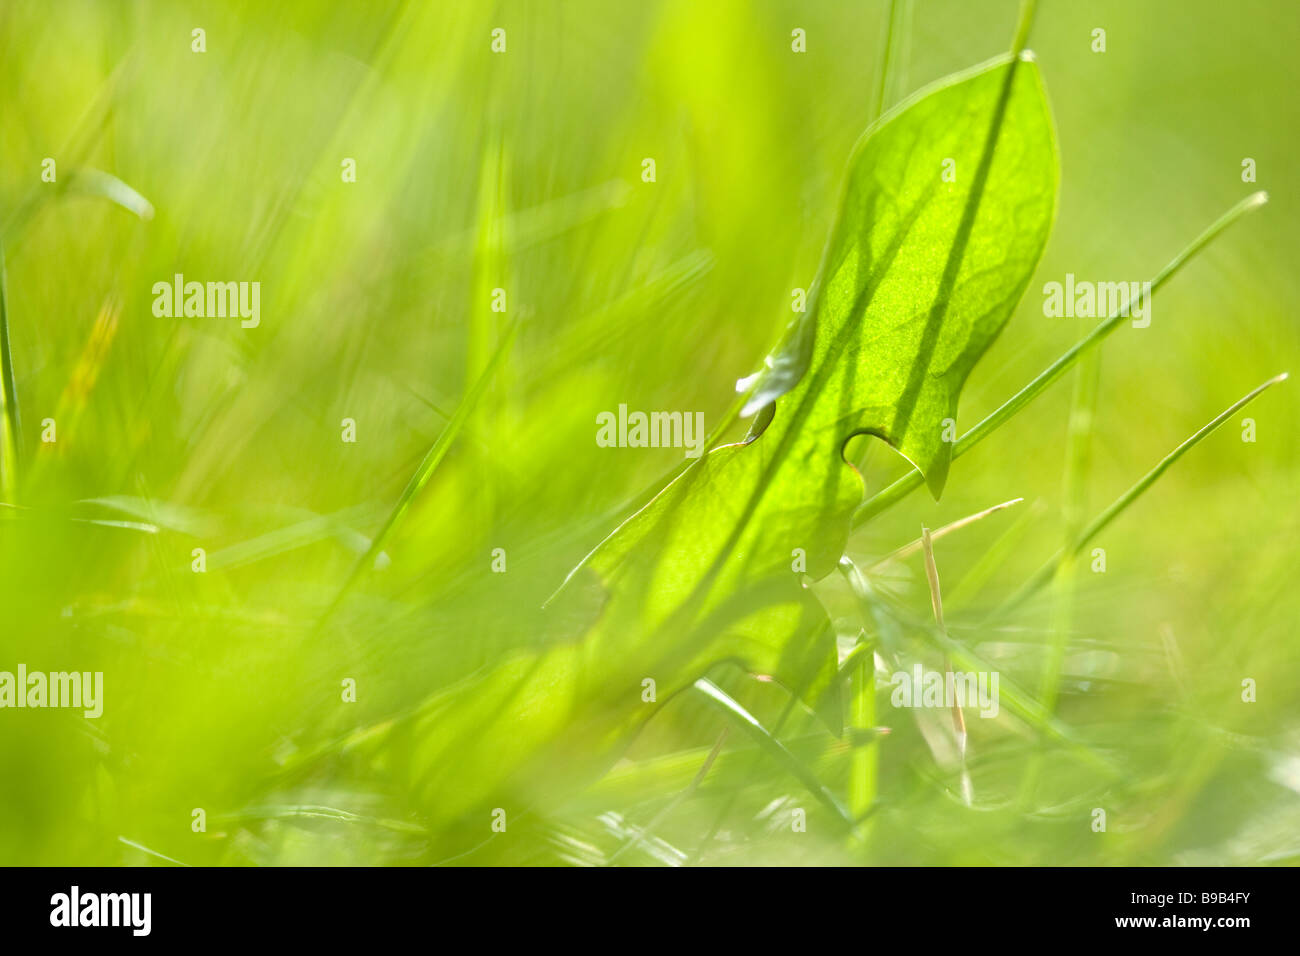 Cerca de campo Dept de pasto de verano Imagen De Stock